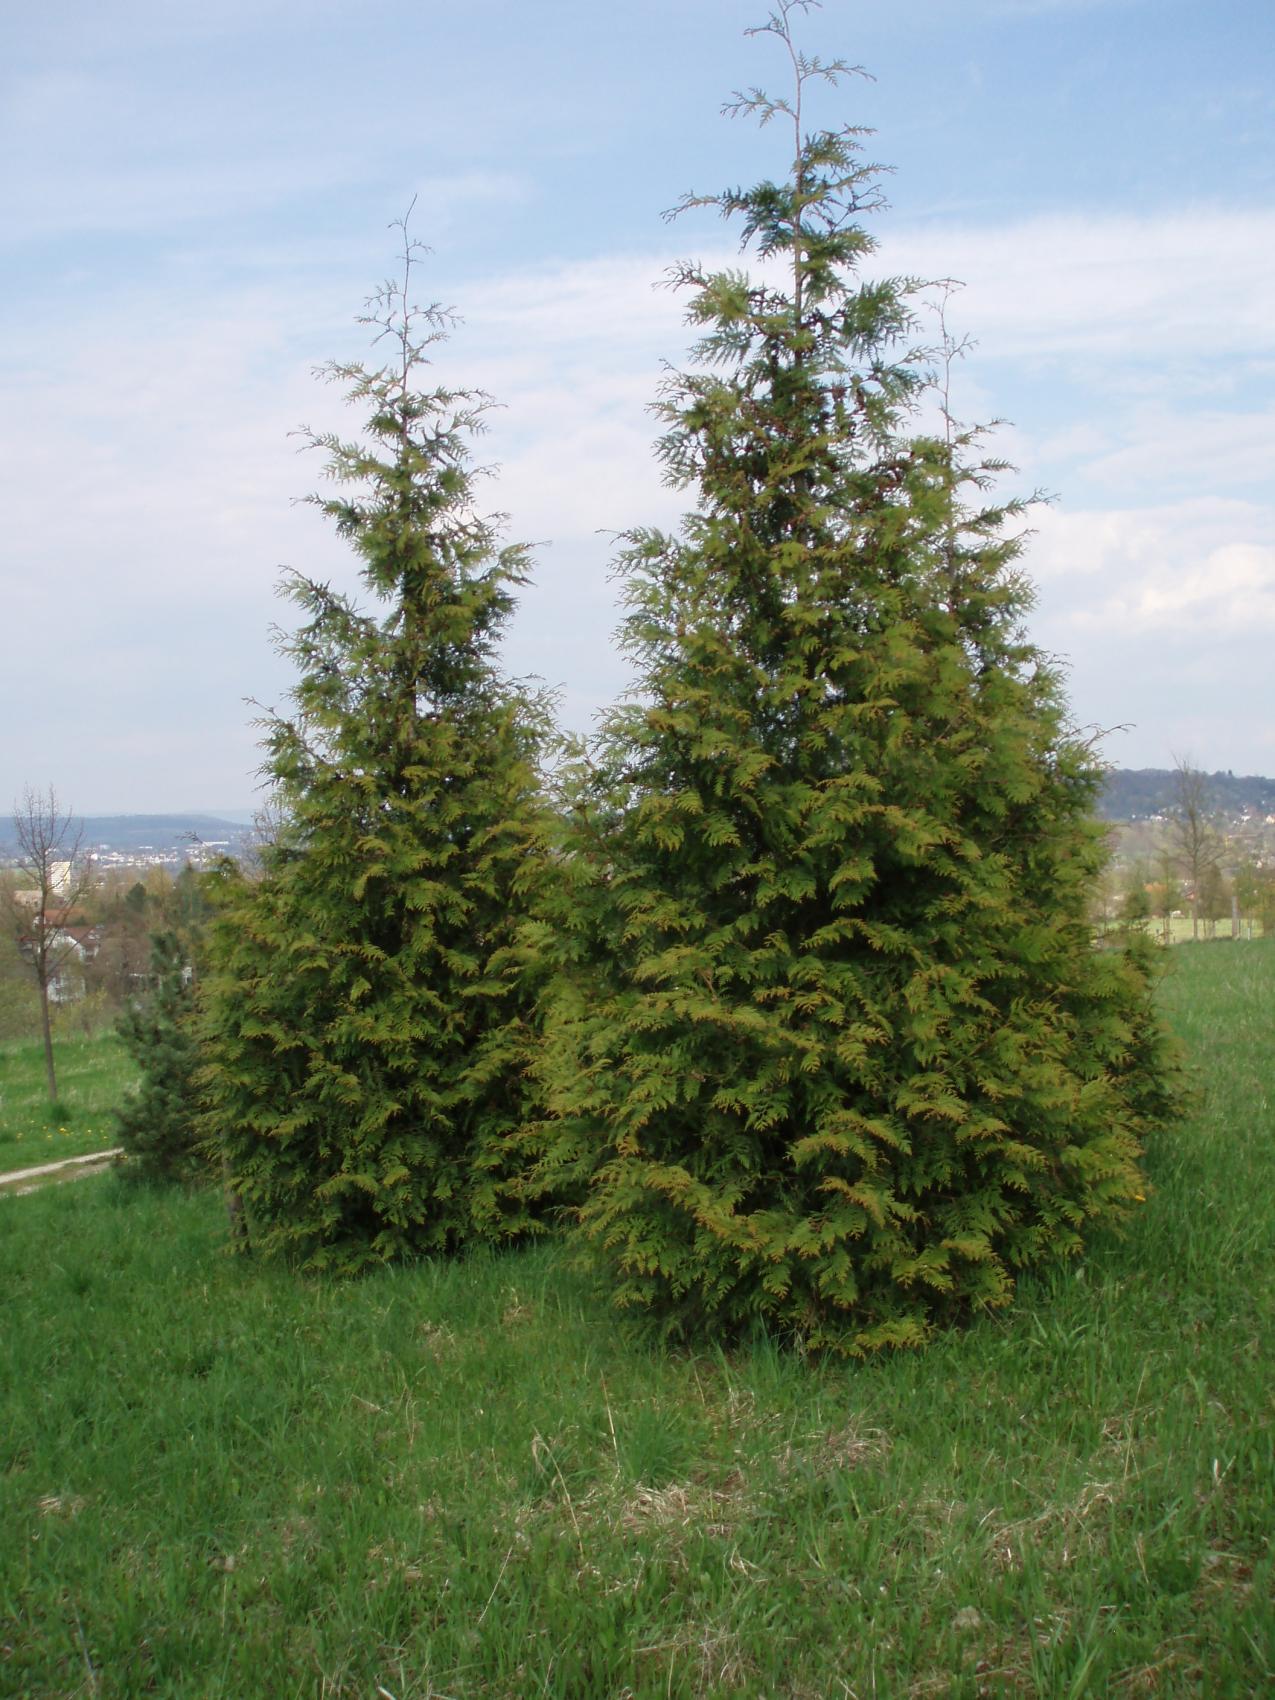 Western Red Cedar (http://www.tree-shop.co.uk/products_detail.asp?productheadingID=1101#sthash.IJ84ZGmq.dpbs)